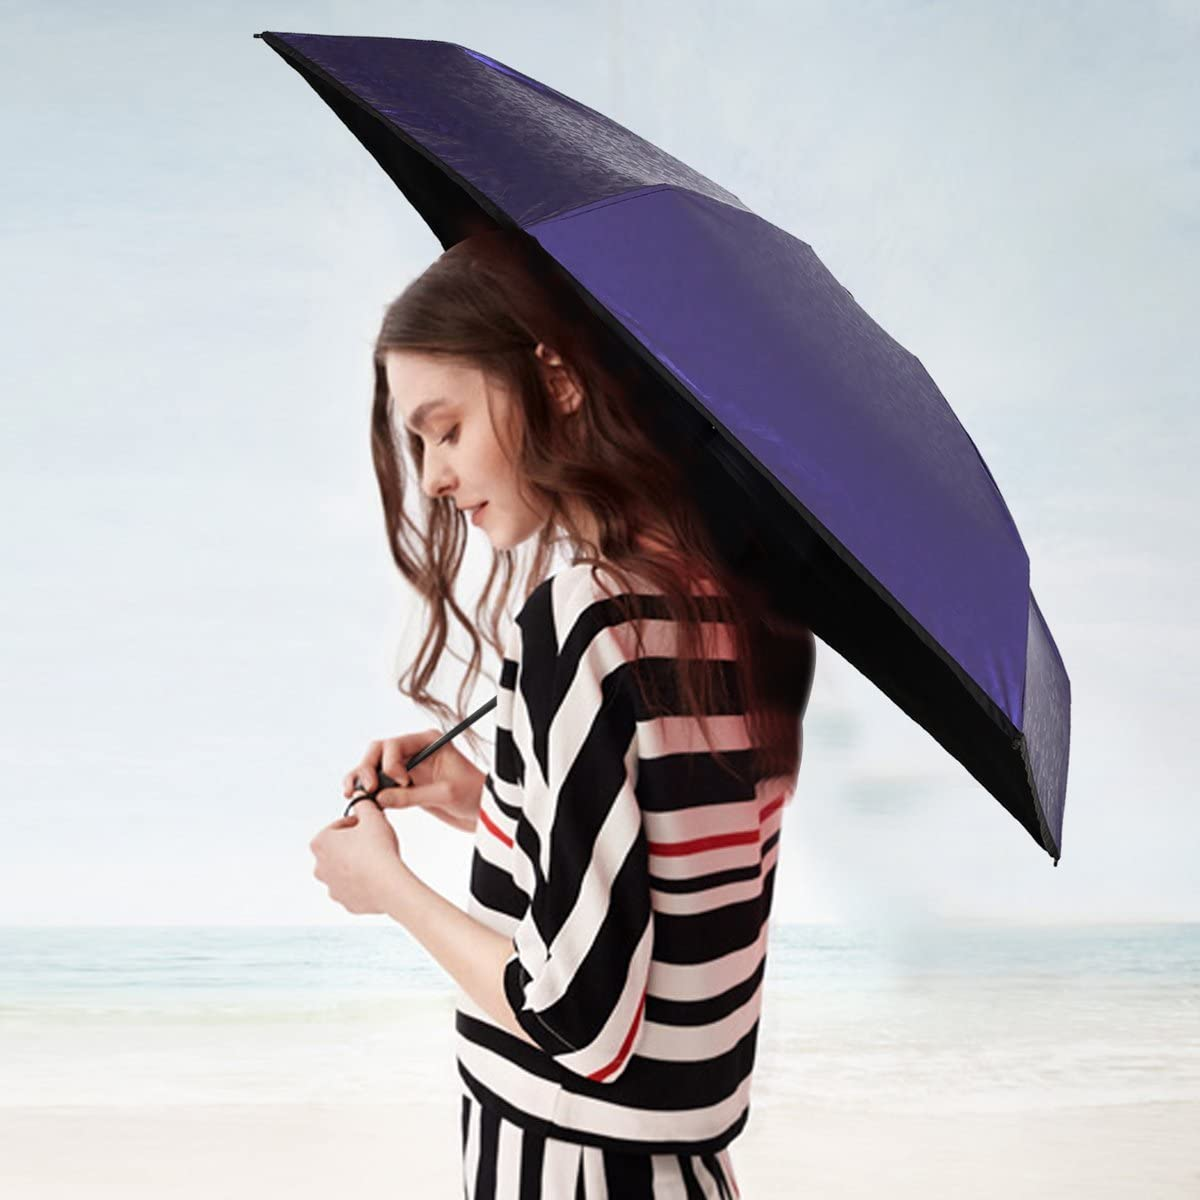 Rauiong Travel Mini Ultralight 6.7 ,Open Diameter Compact UV Umbrella with Gift Case for Women Purse Handbag 38.6 7.4oz